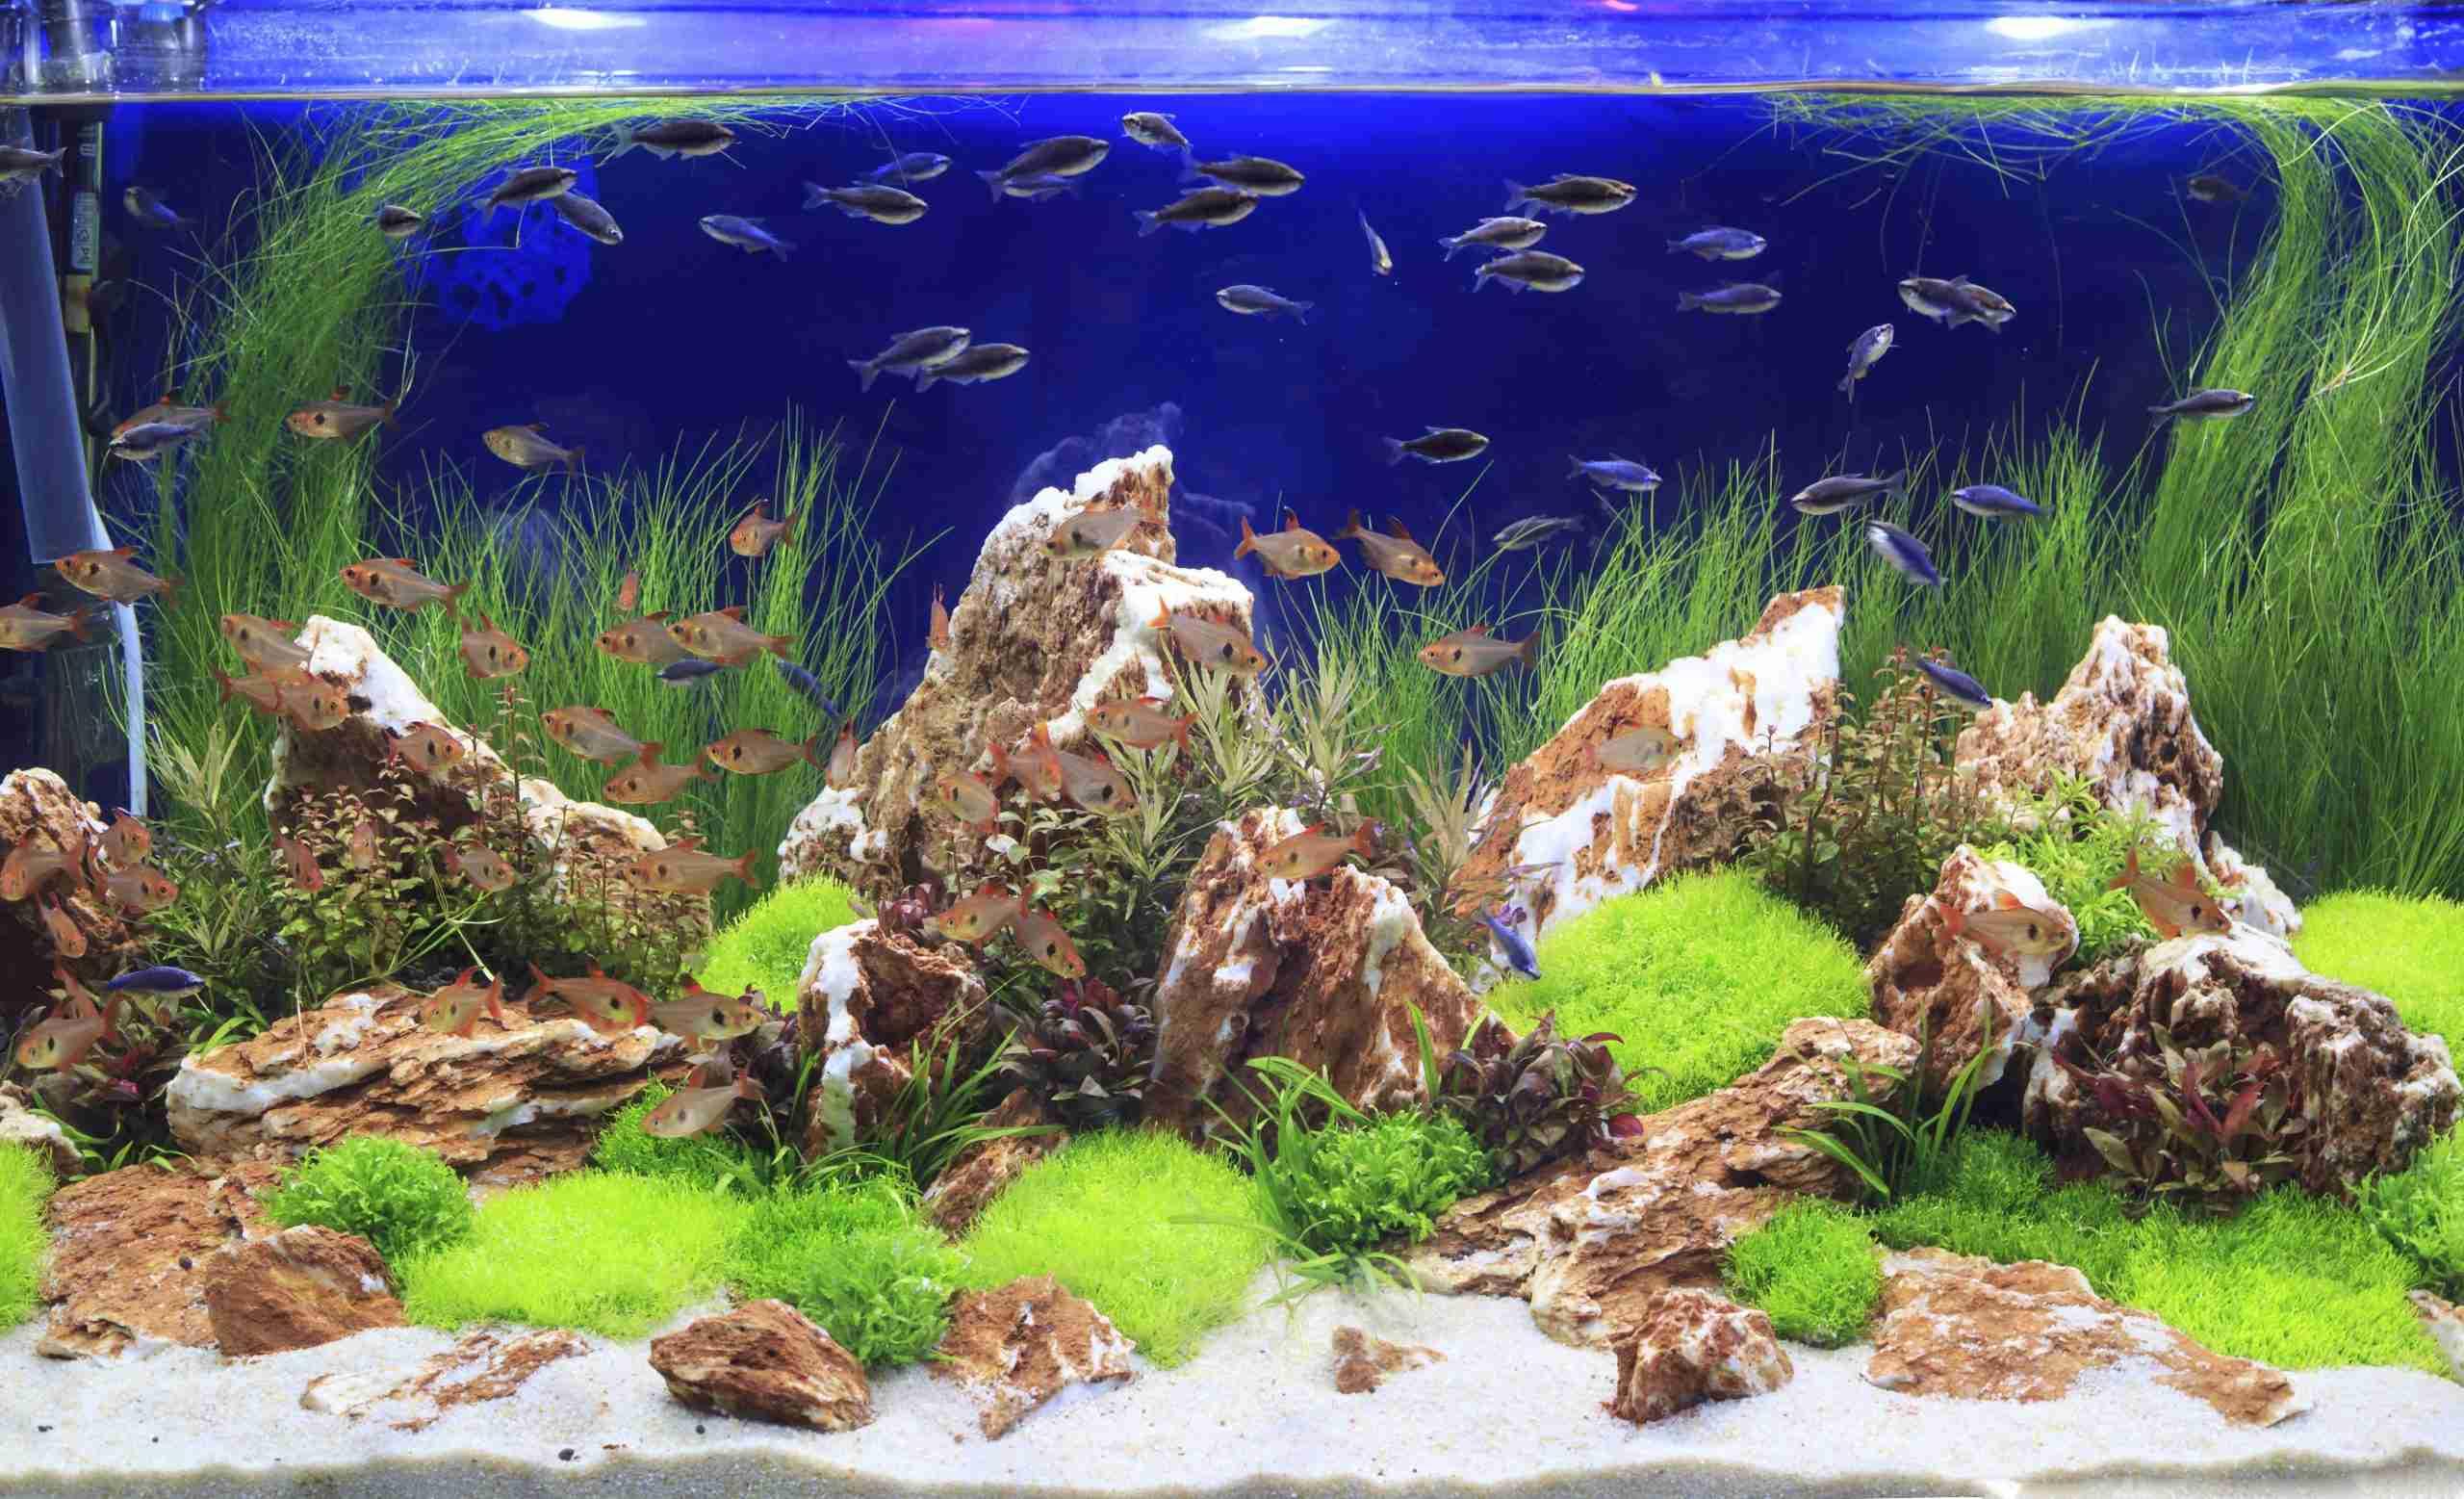 10 fish tank gallon setup best ❣️ 2021 for Top 10